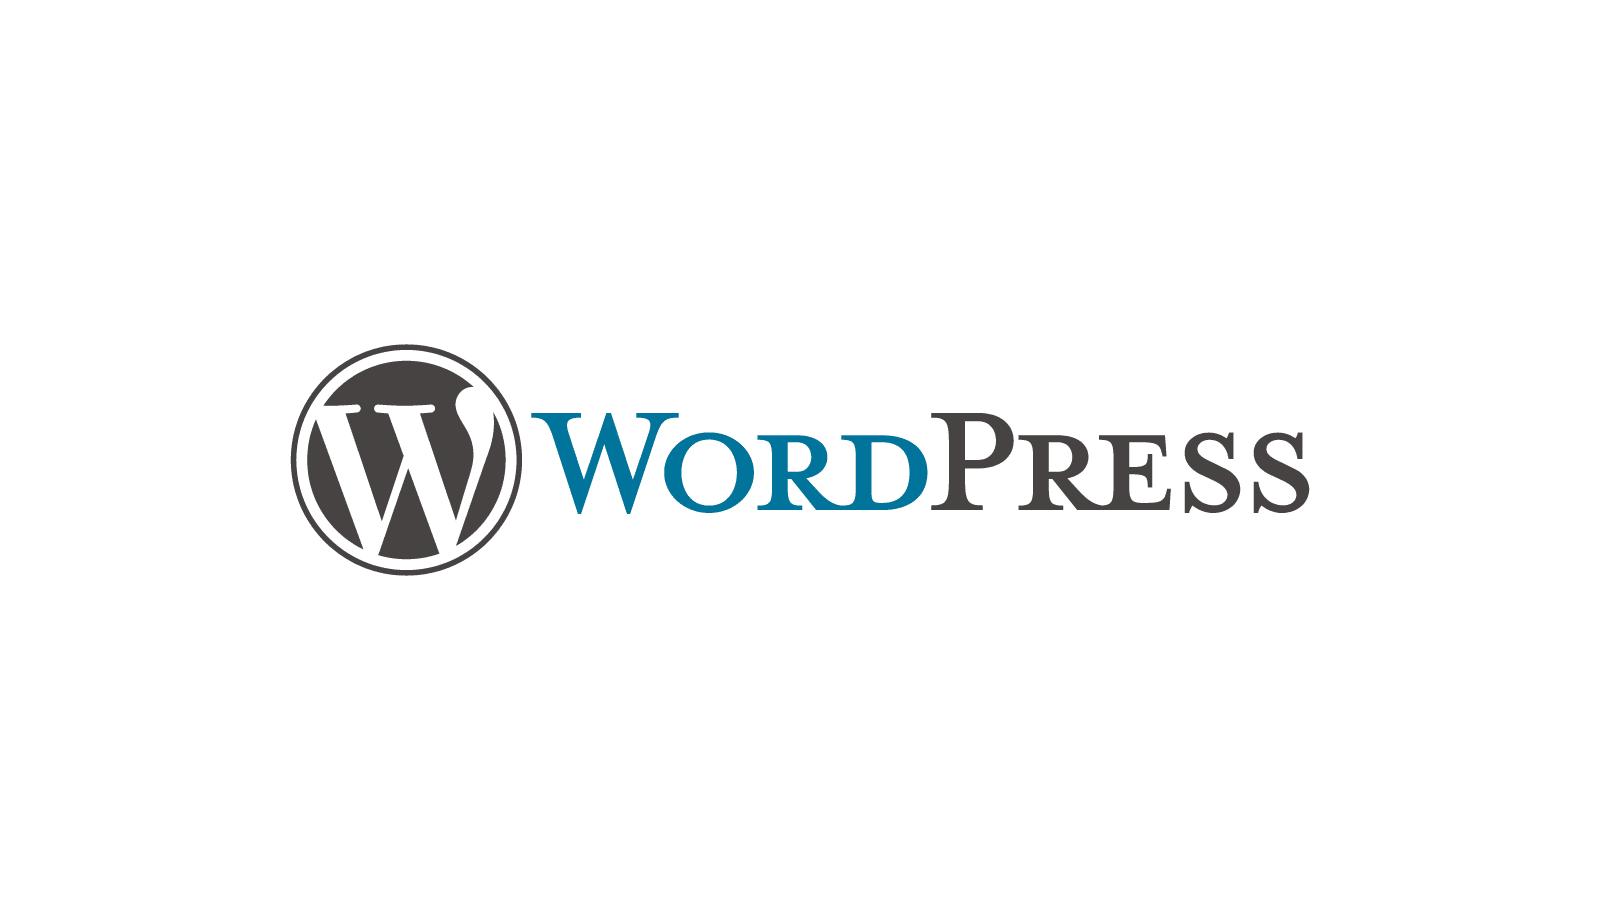 WordPressで登録済みのショートコードをsingle.phpなどテンプレートファイルからコードを記述して呼び出す方法